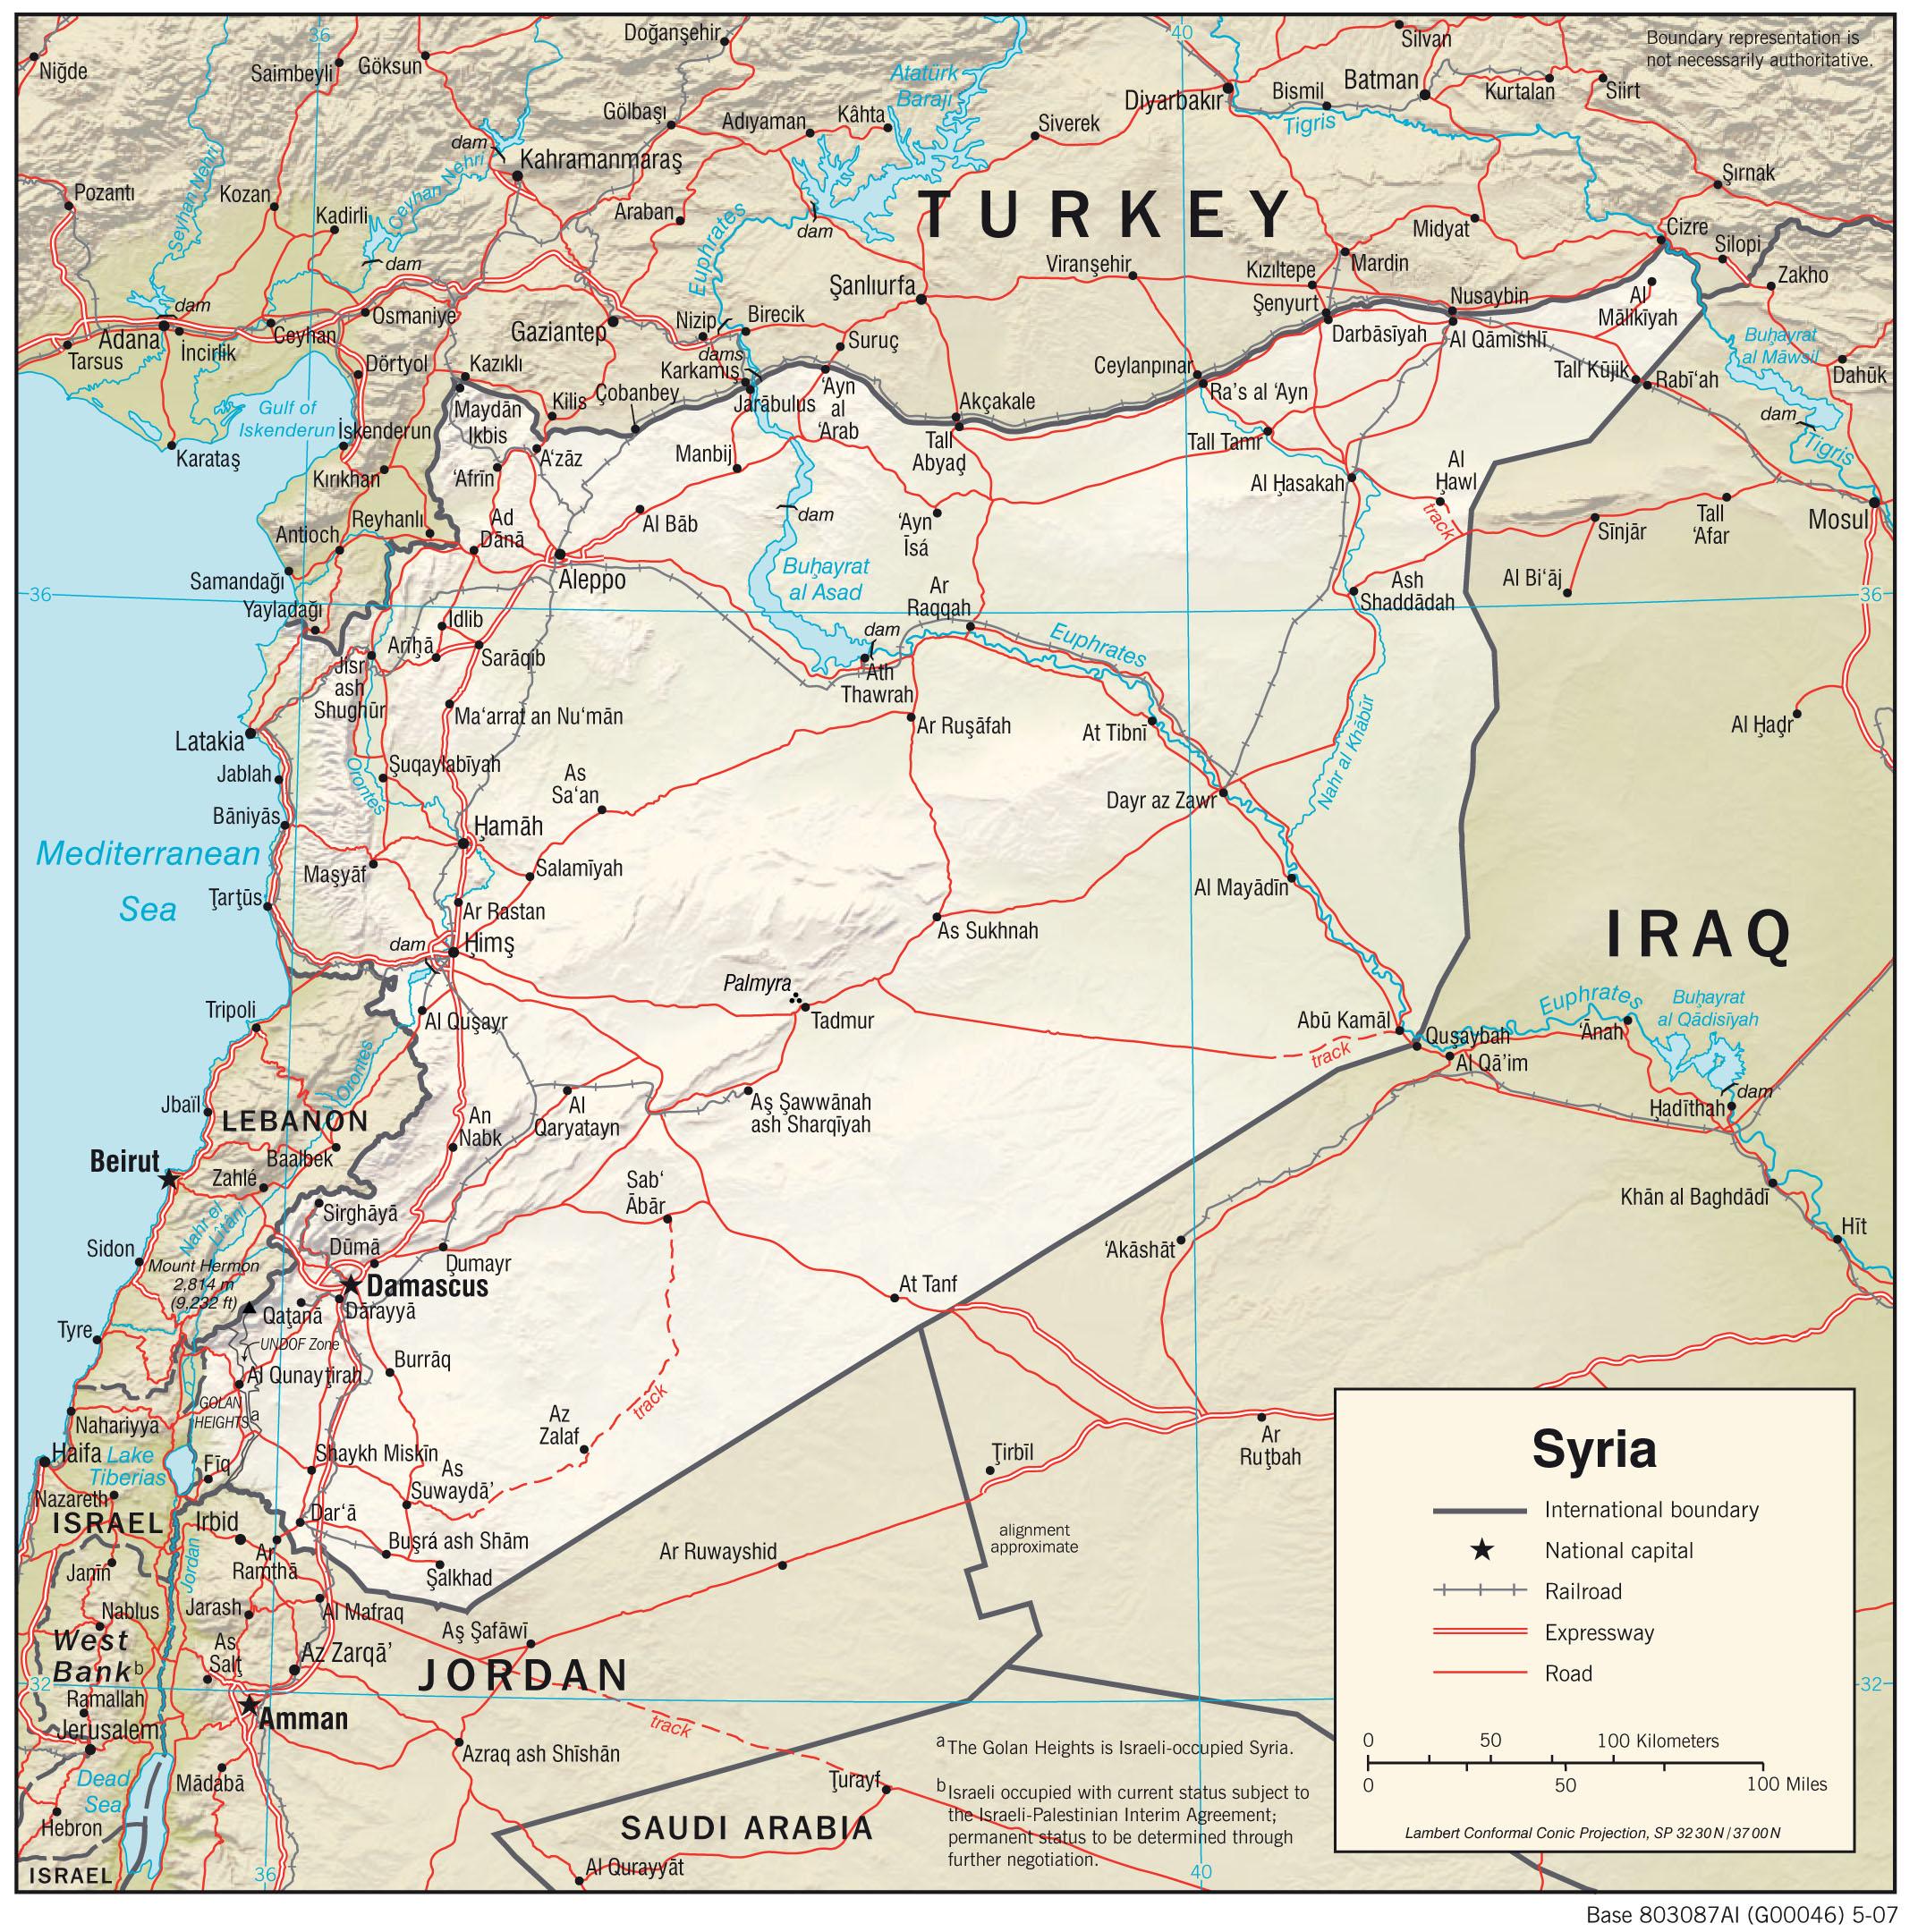 Maps - Syria - LibGuides at Naval War College Damascus Syria Map on baghdad map, amman jordan map, tel aviv, arabian sea map, golan heights map, bashar al-assad, rome italy map, damascus citadel, tunis tunisia map, pakistan map, world map, beirut lebanon map, ancient damascus map, asma al-assad, tripoli lebanon map, mid east map, middle east map, jerusalem map, damascus oregon map, kabul afghanistan map, istanbul map, algiers algeria map, bahrain map, damascus steel,